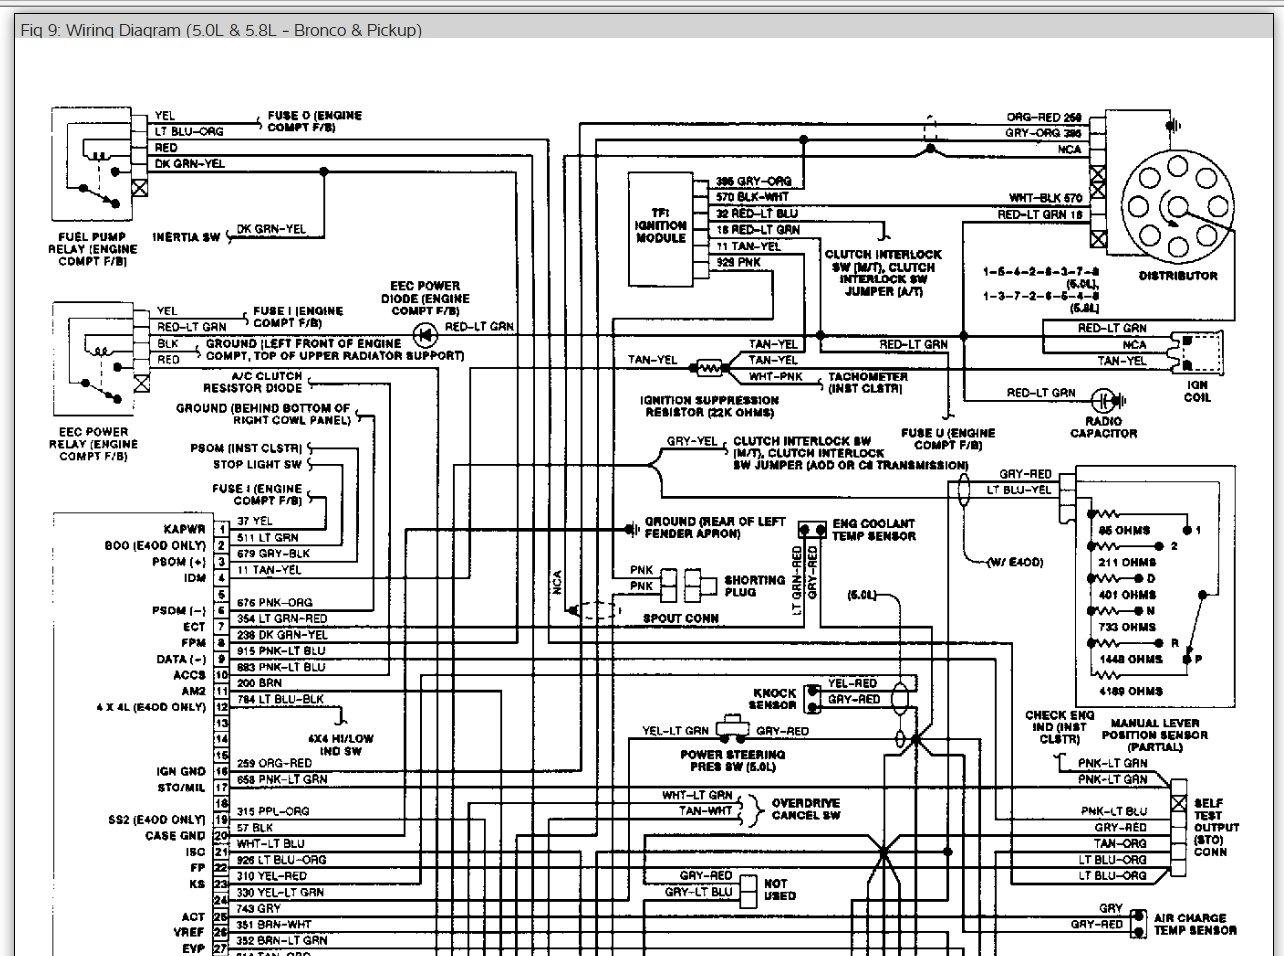 Crank Sensor Wiring Diagram 4ze1 Vauxhall Meriva Fuse Box Diagram Peugeotjetforce Tukune Jeanjaures37 Fr